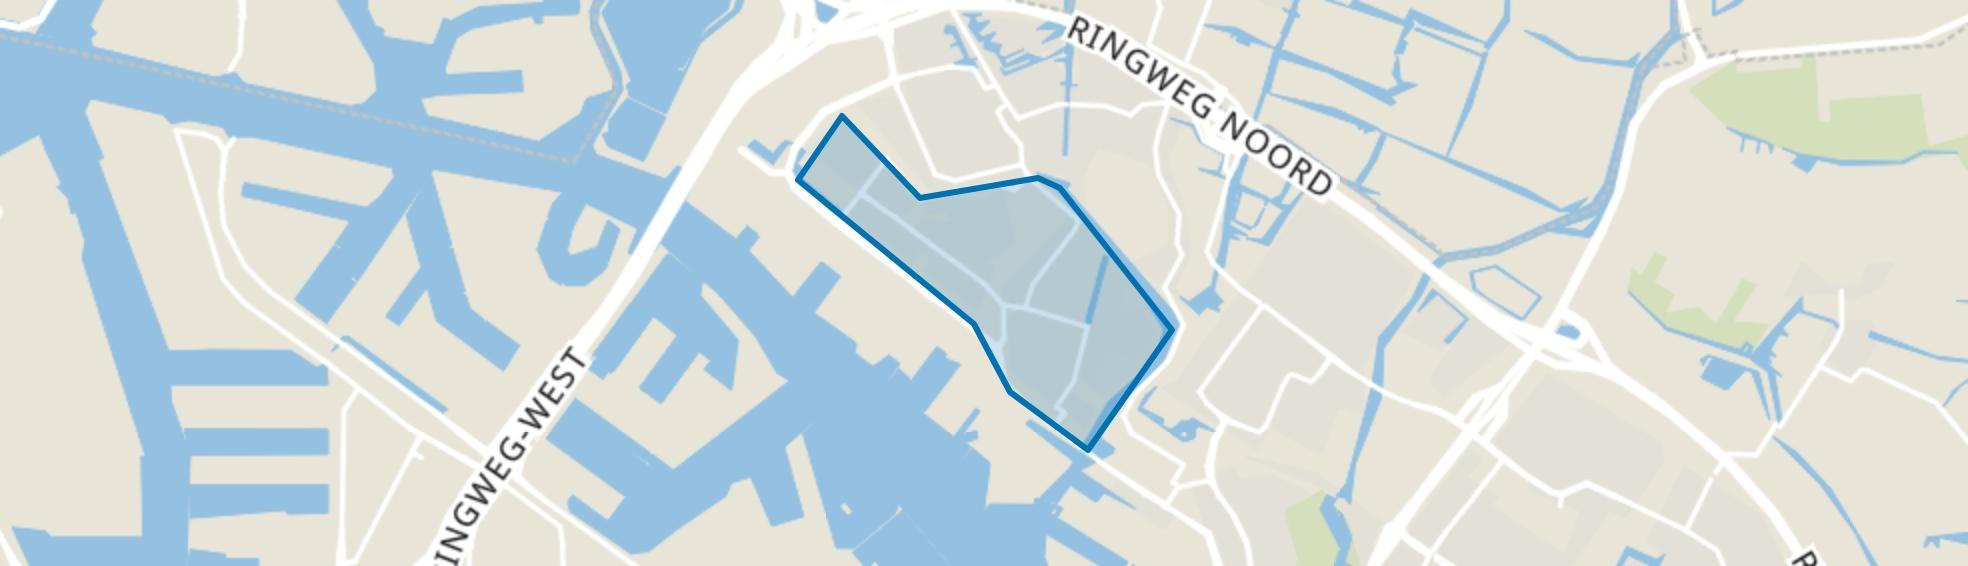 Tuindorp Oostzaan, Amsterdam map